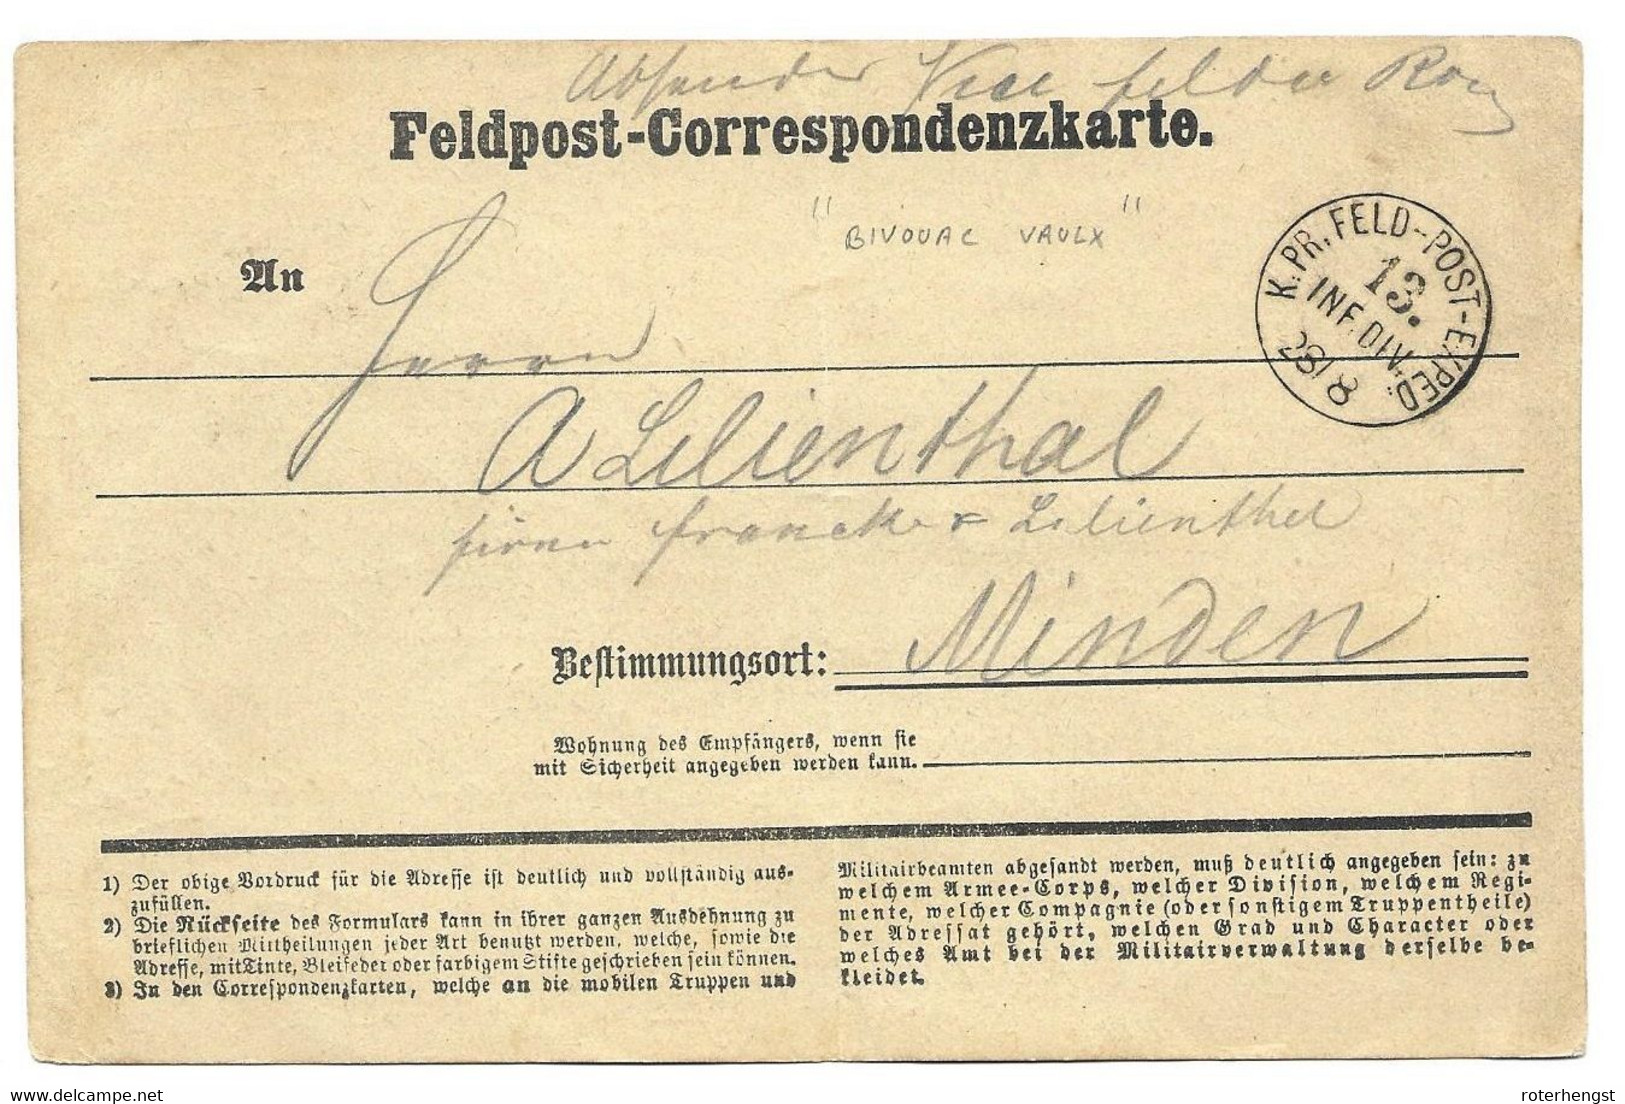 1870-71 Feldpost Card From A German Soldier In Bivouac / Vaulx - Wars